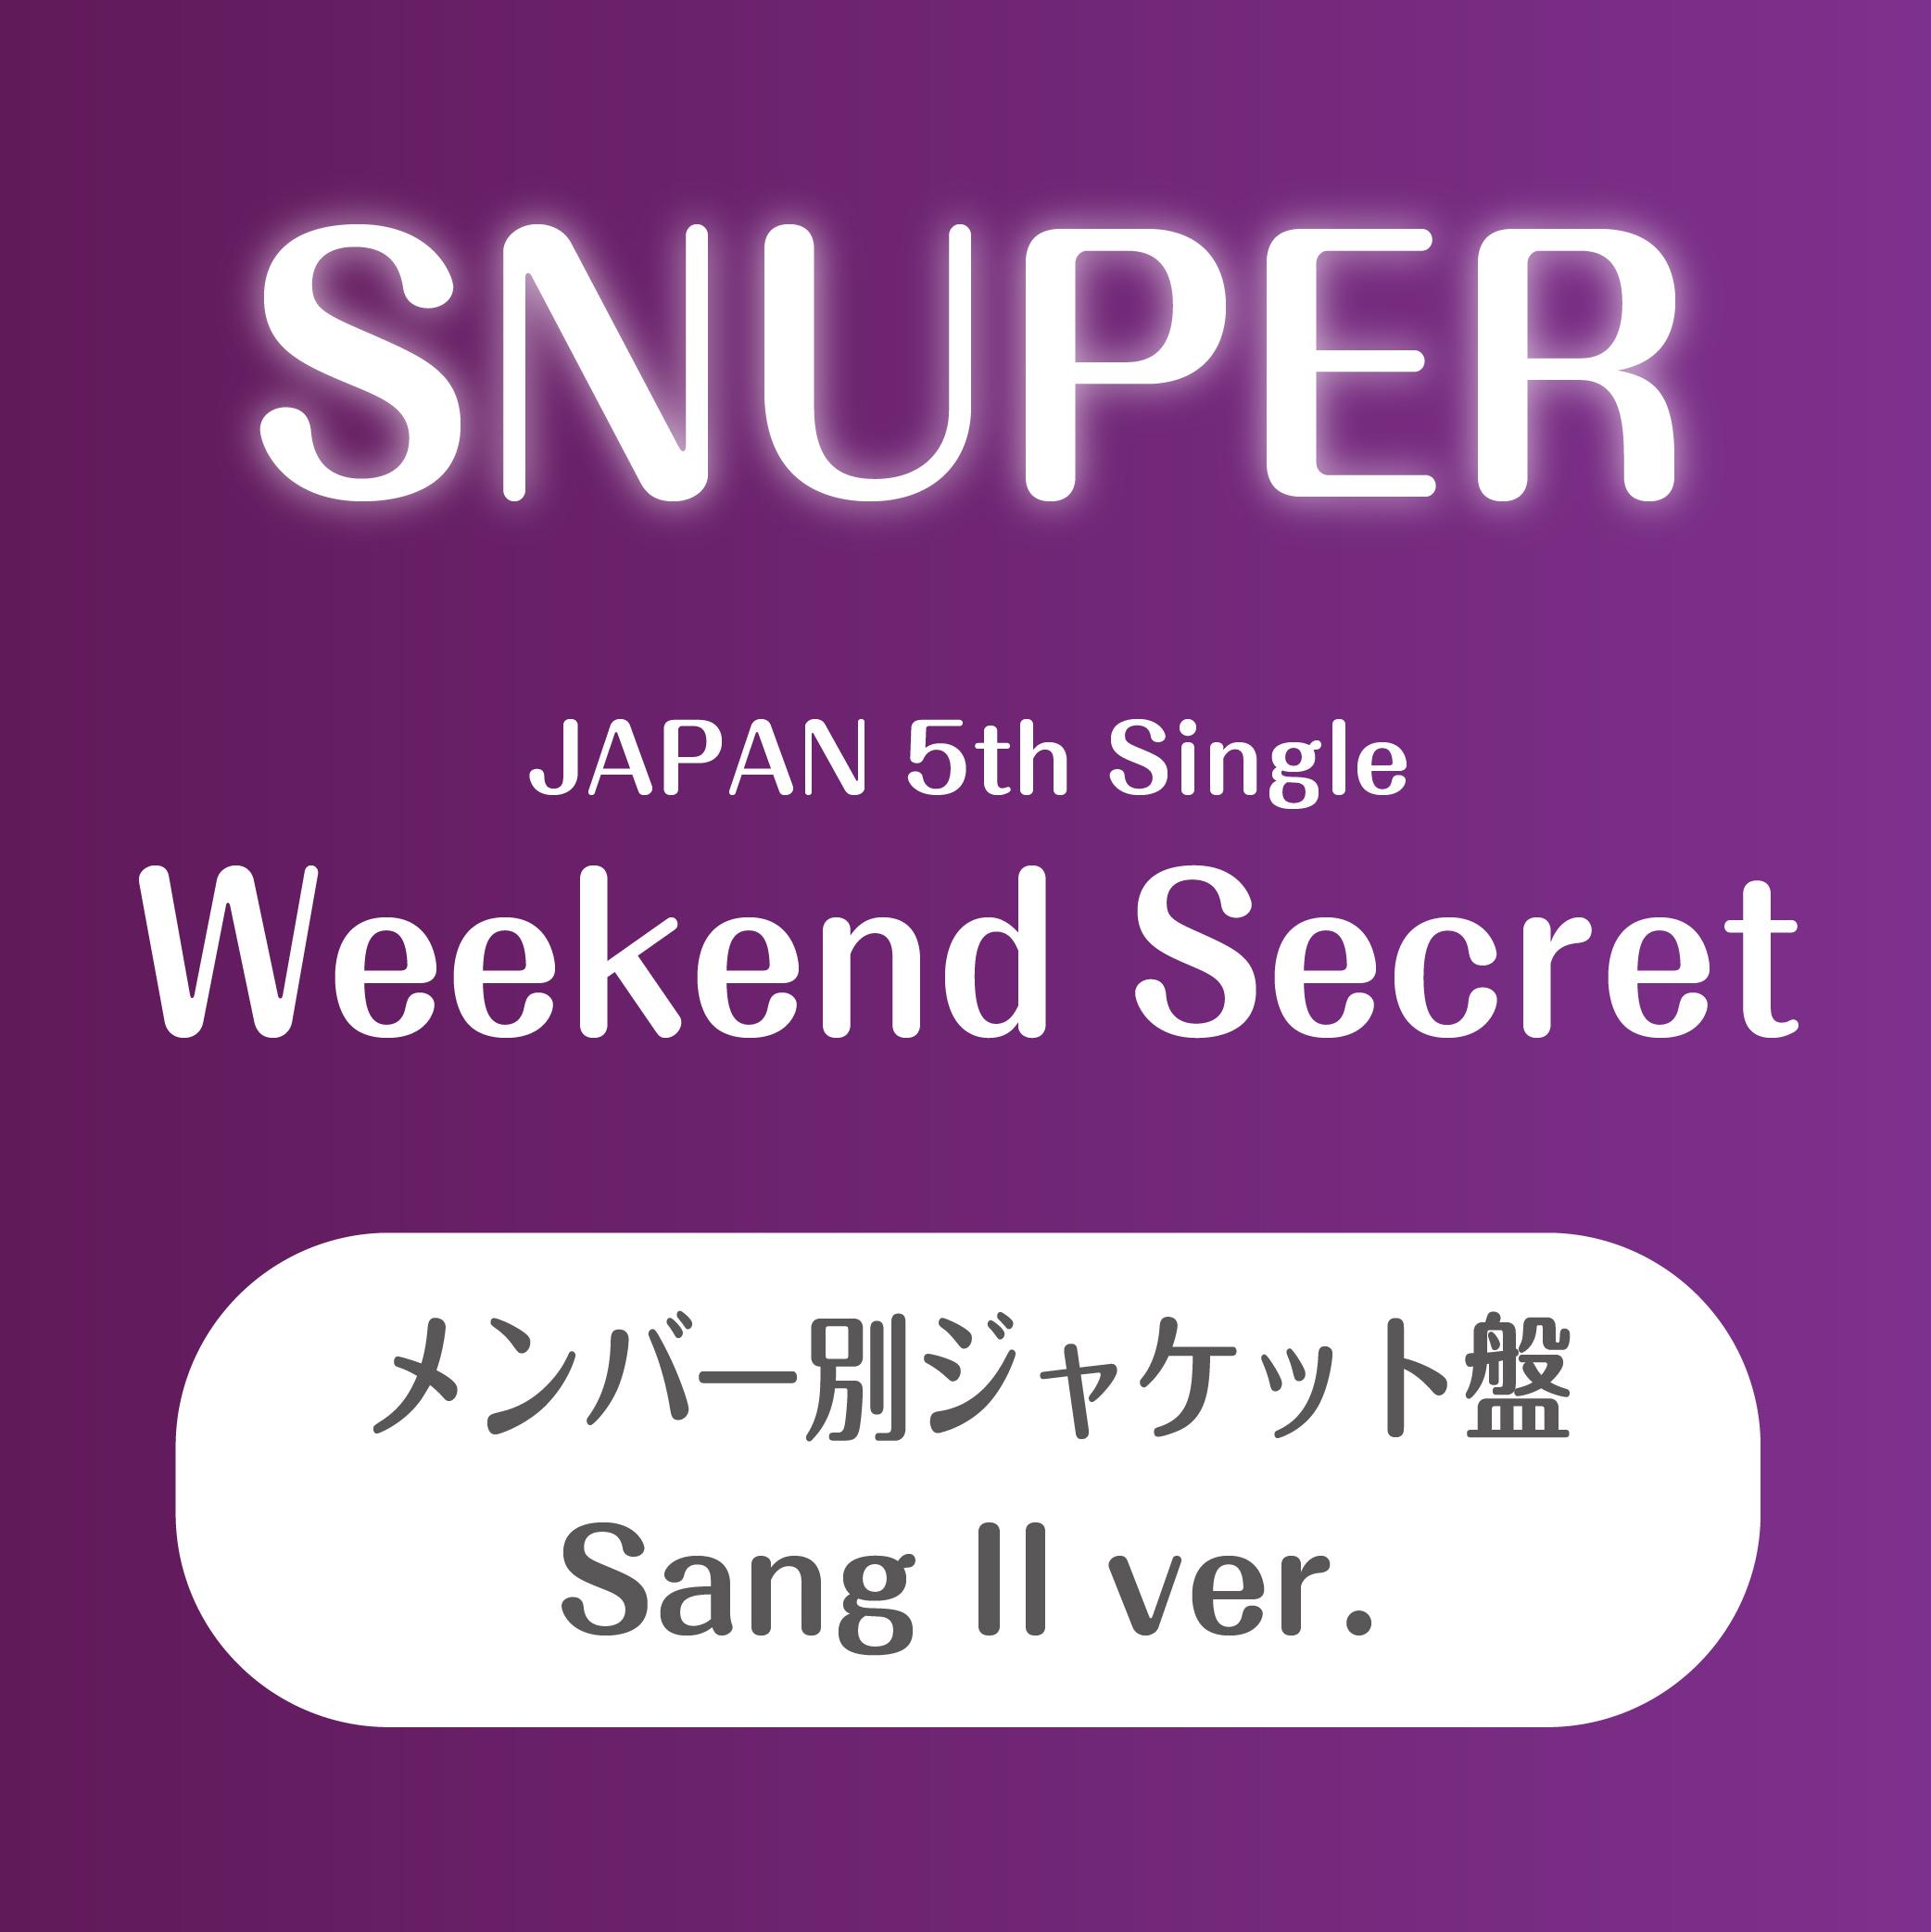 SNUPER日本5thシングル 『Weekend Secret』個別ジャケット盤(サンイル)【予約(クレジット決済のみ)】